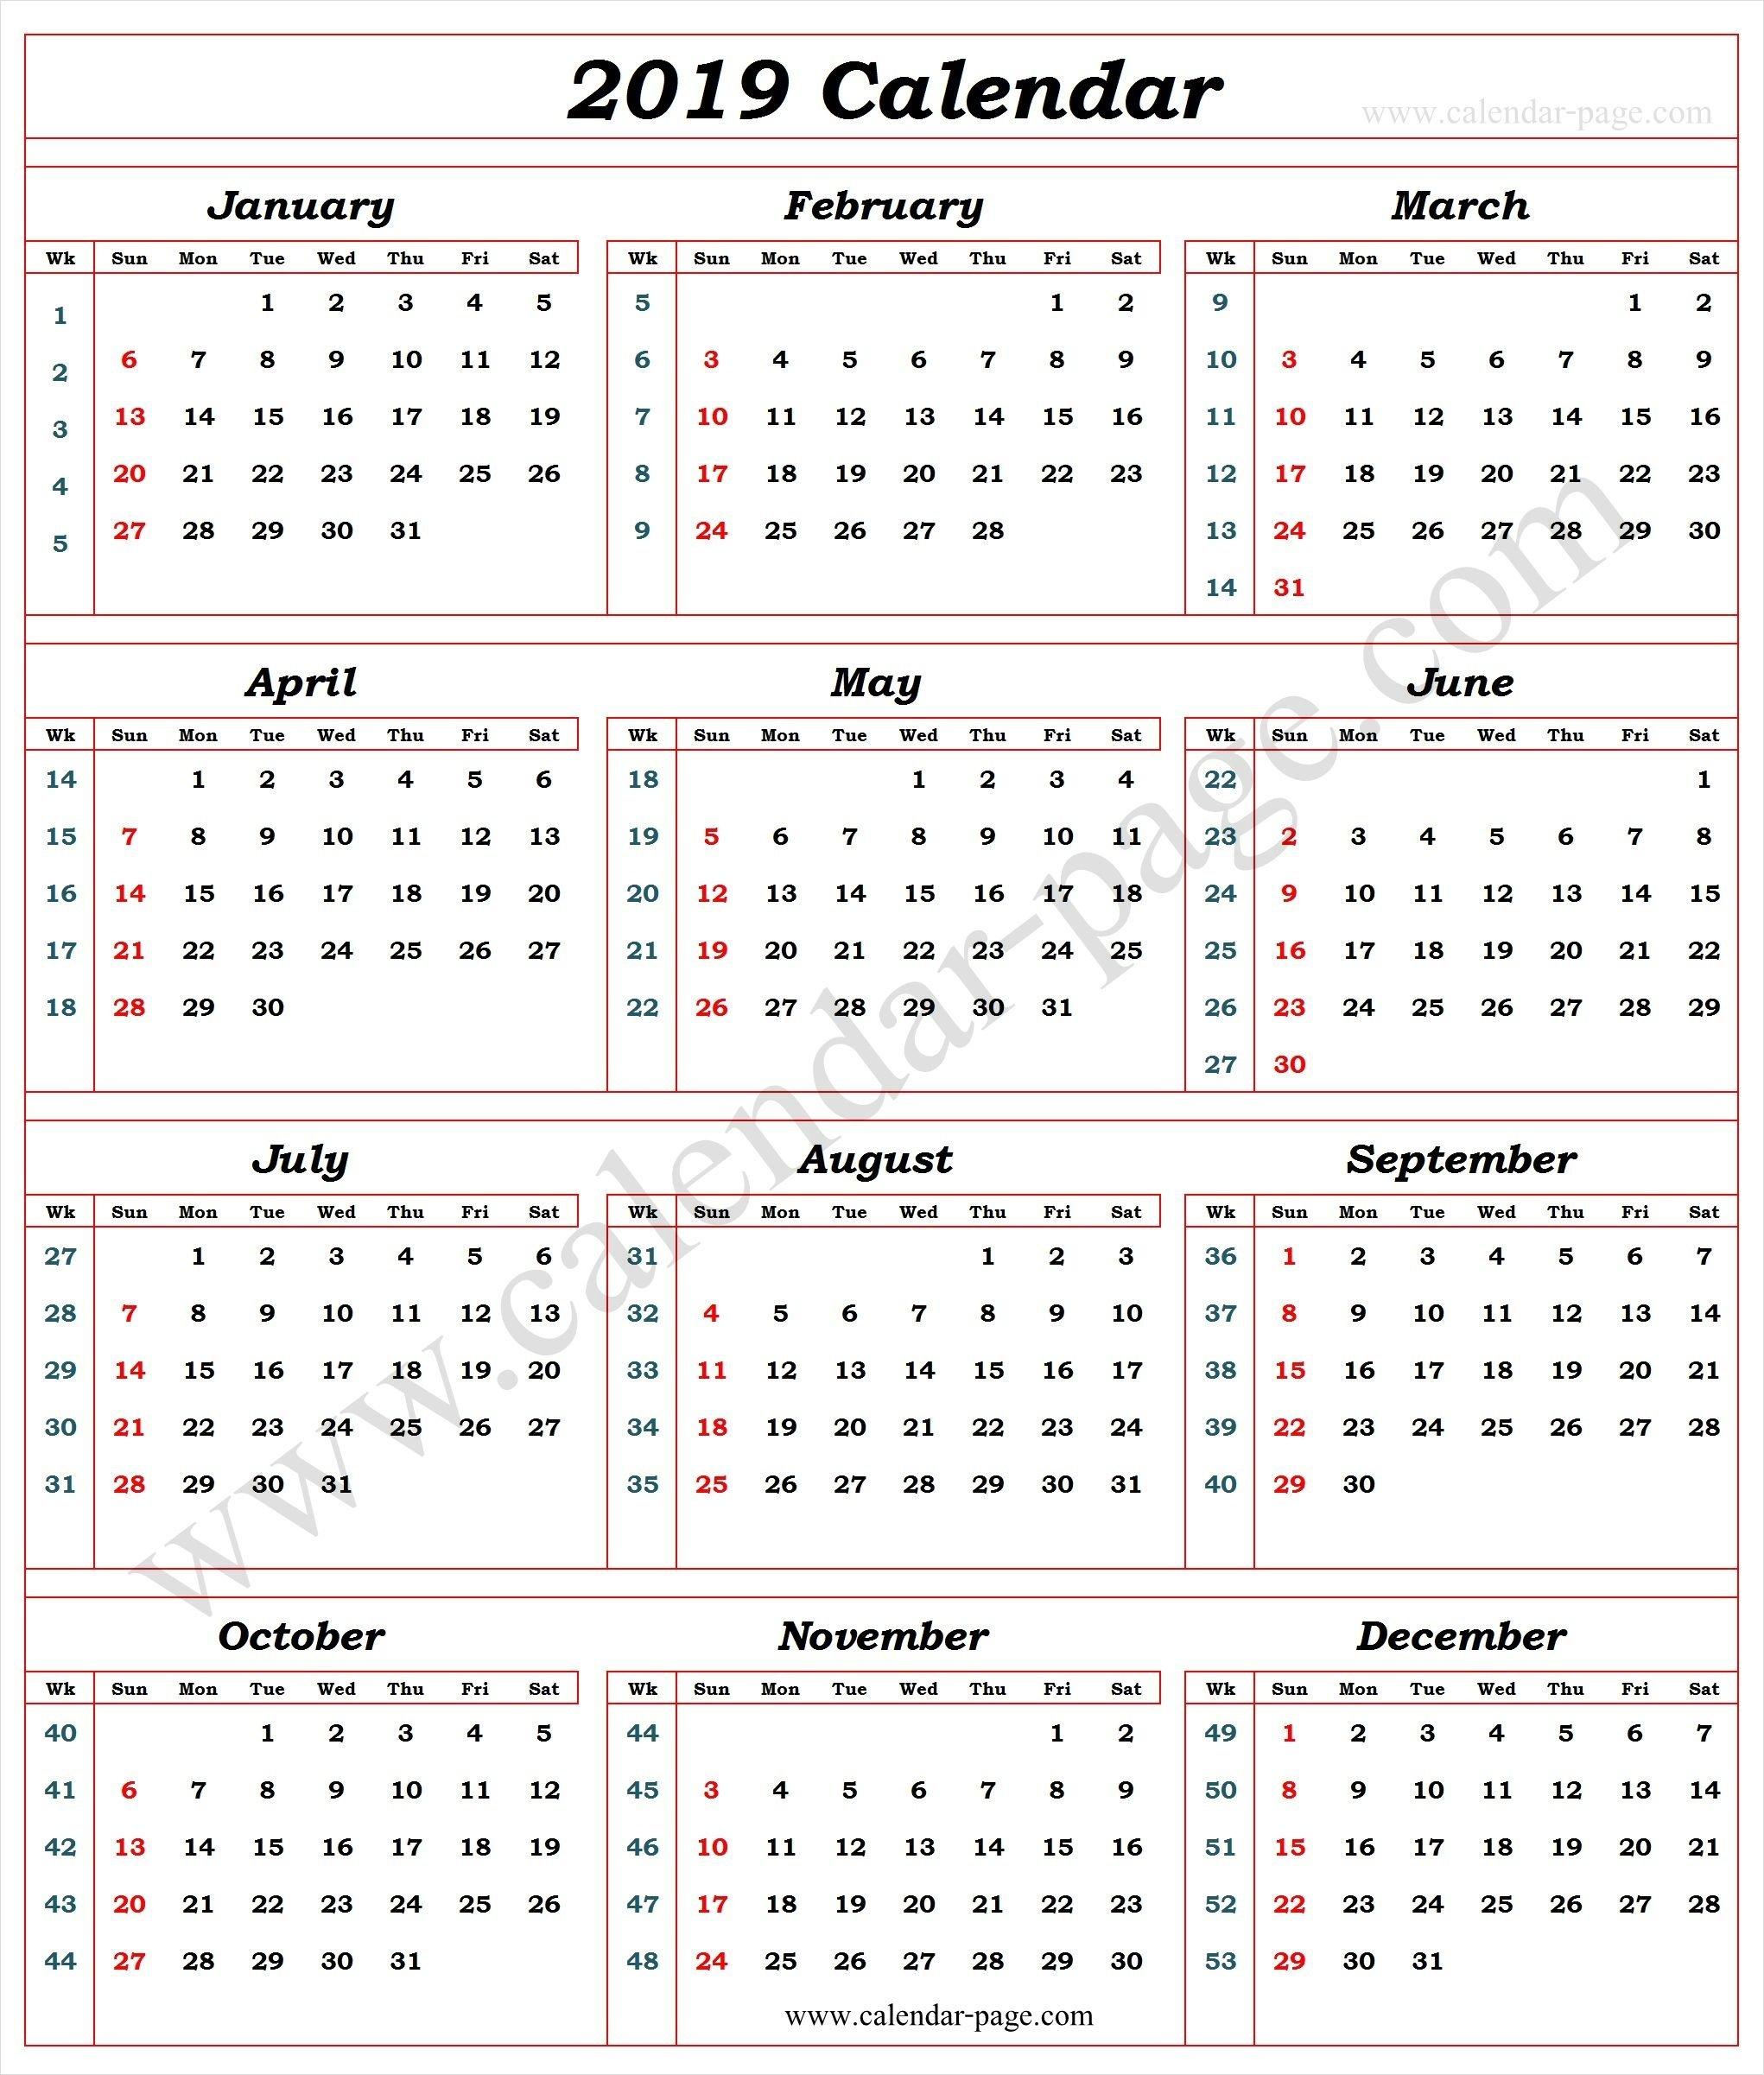 Calendar 2019 With Week Numbers | 2019 Calendar Template | Calendar Calendar 2019 Week 1